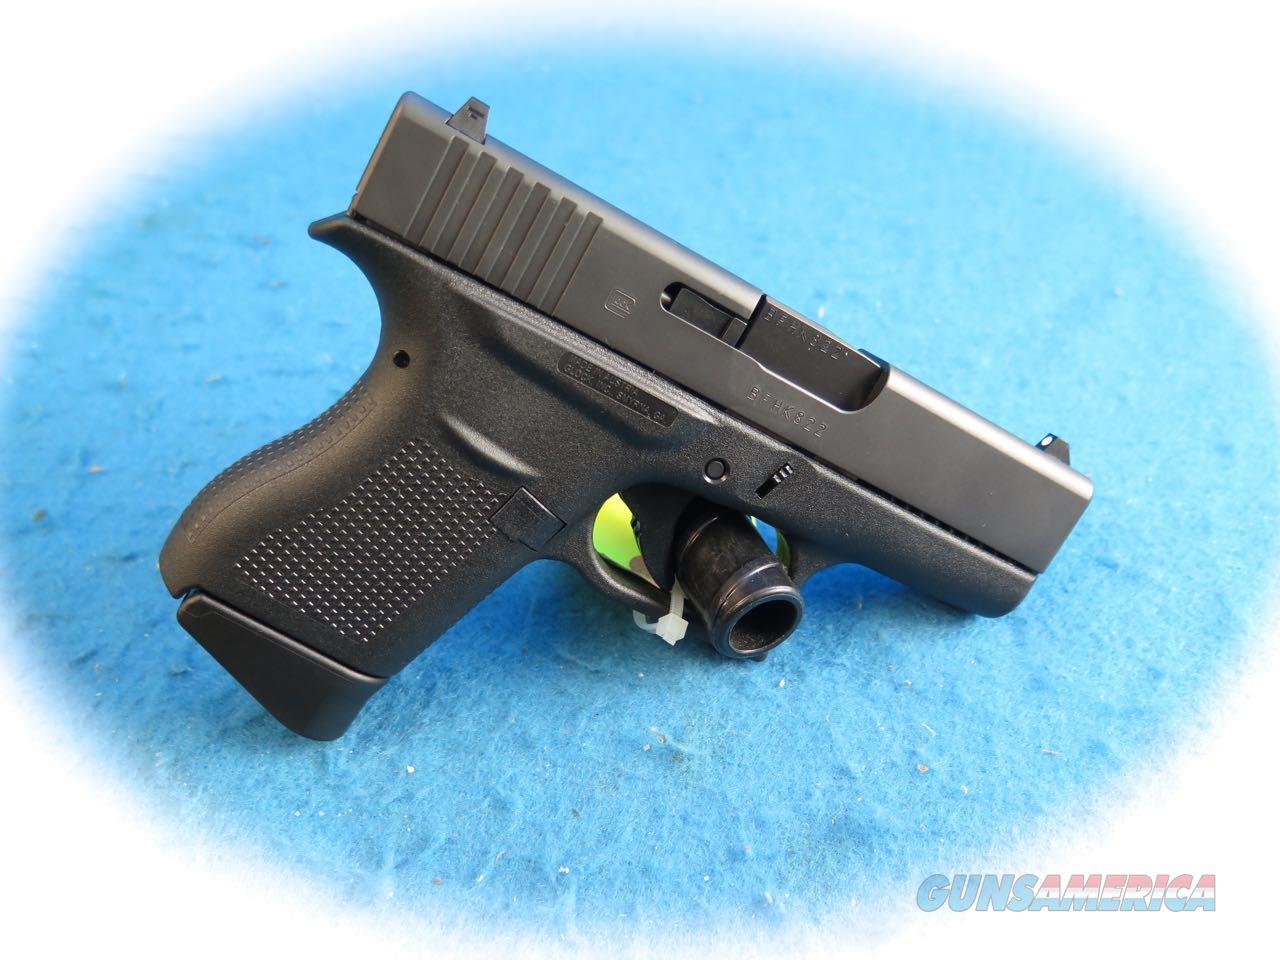 Glock Model 43 9mm Semi Auto Pistol **New**  Guns > Pistols > Glock Pistols > 43